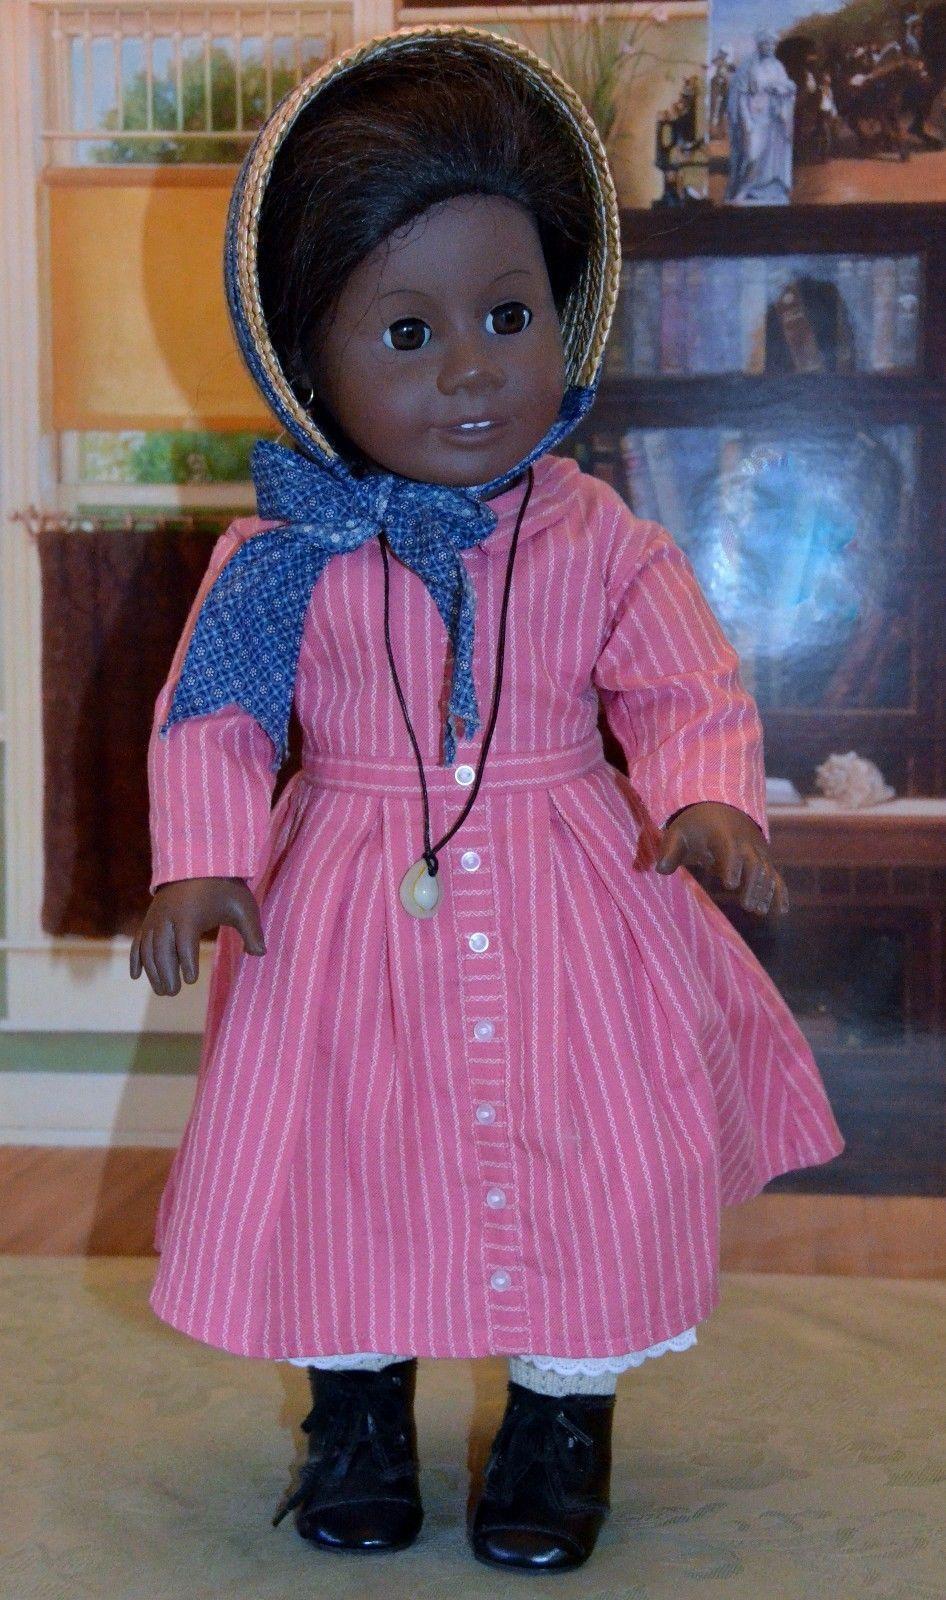 American girl addy walker doll pleasant company meet oufit